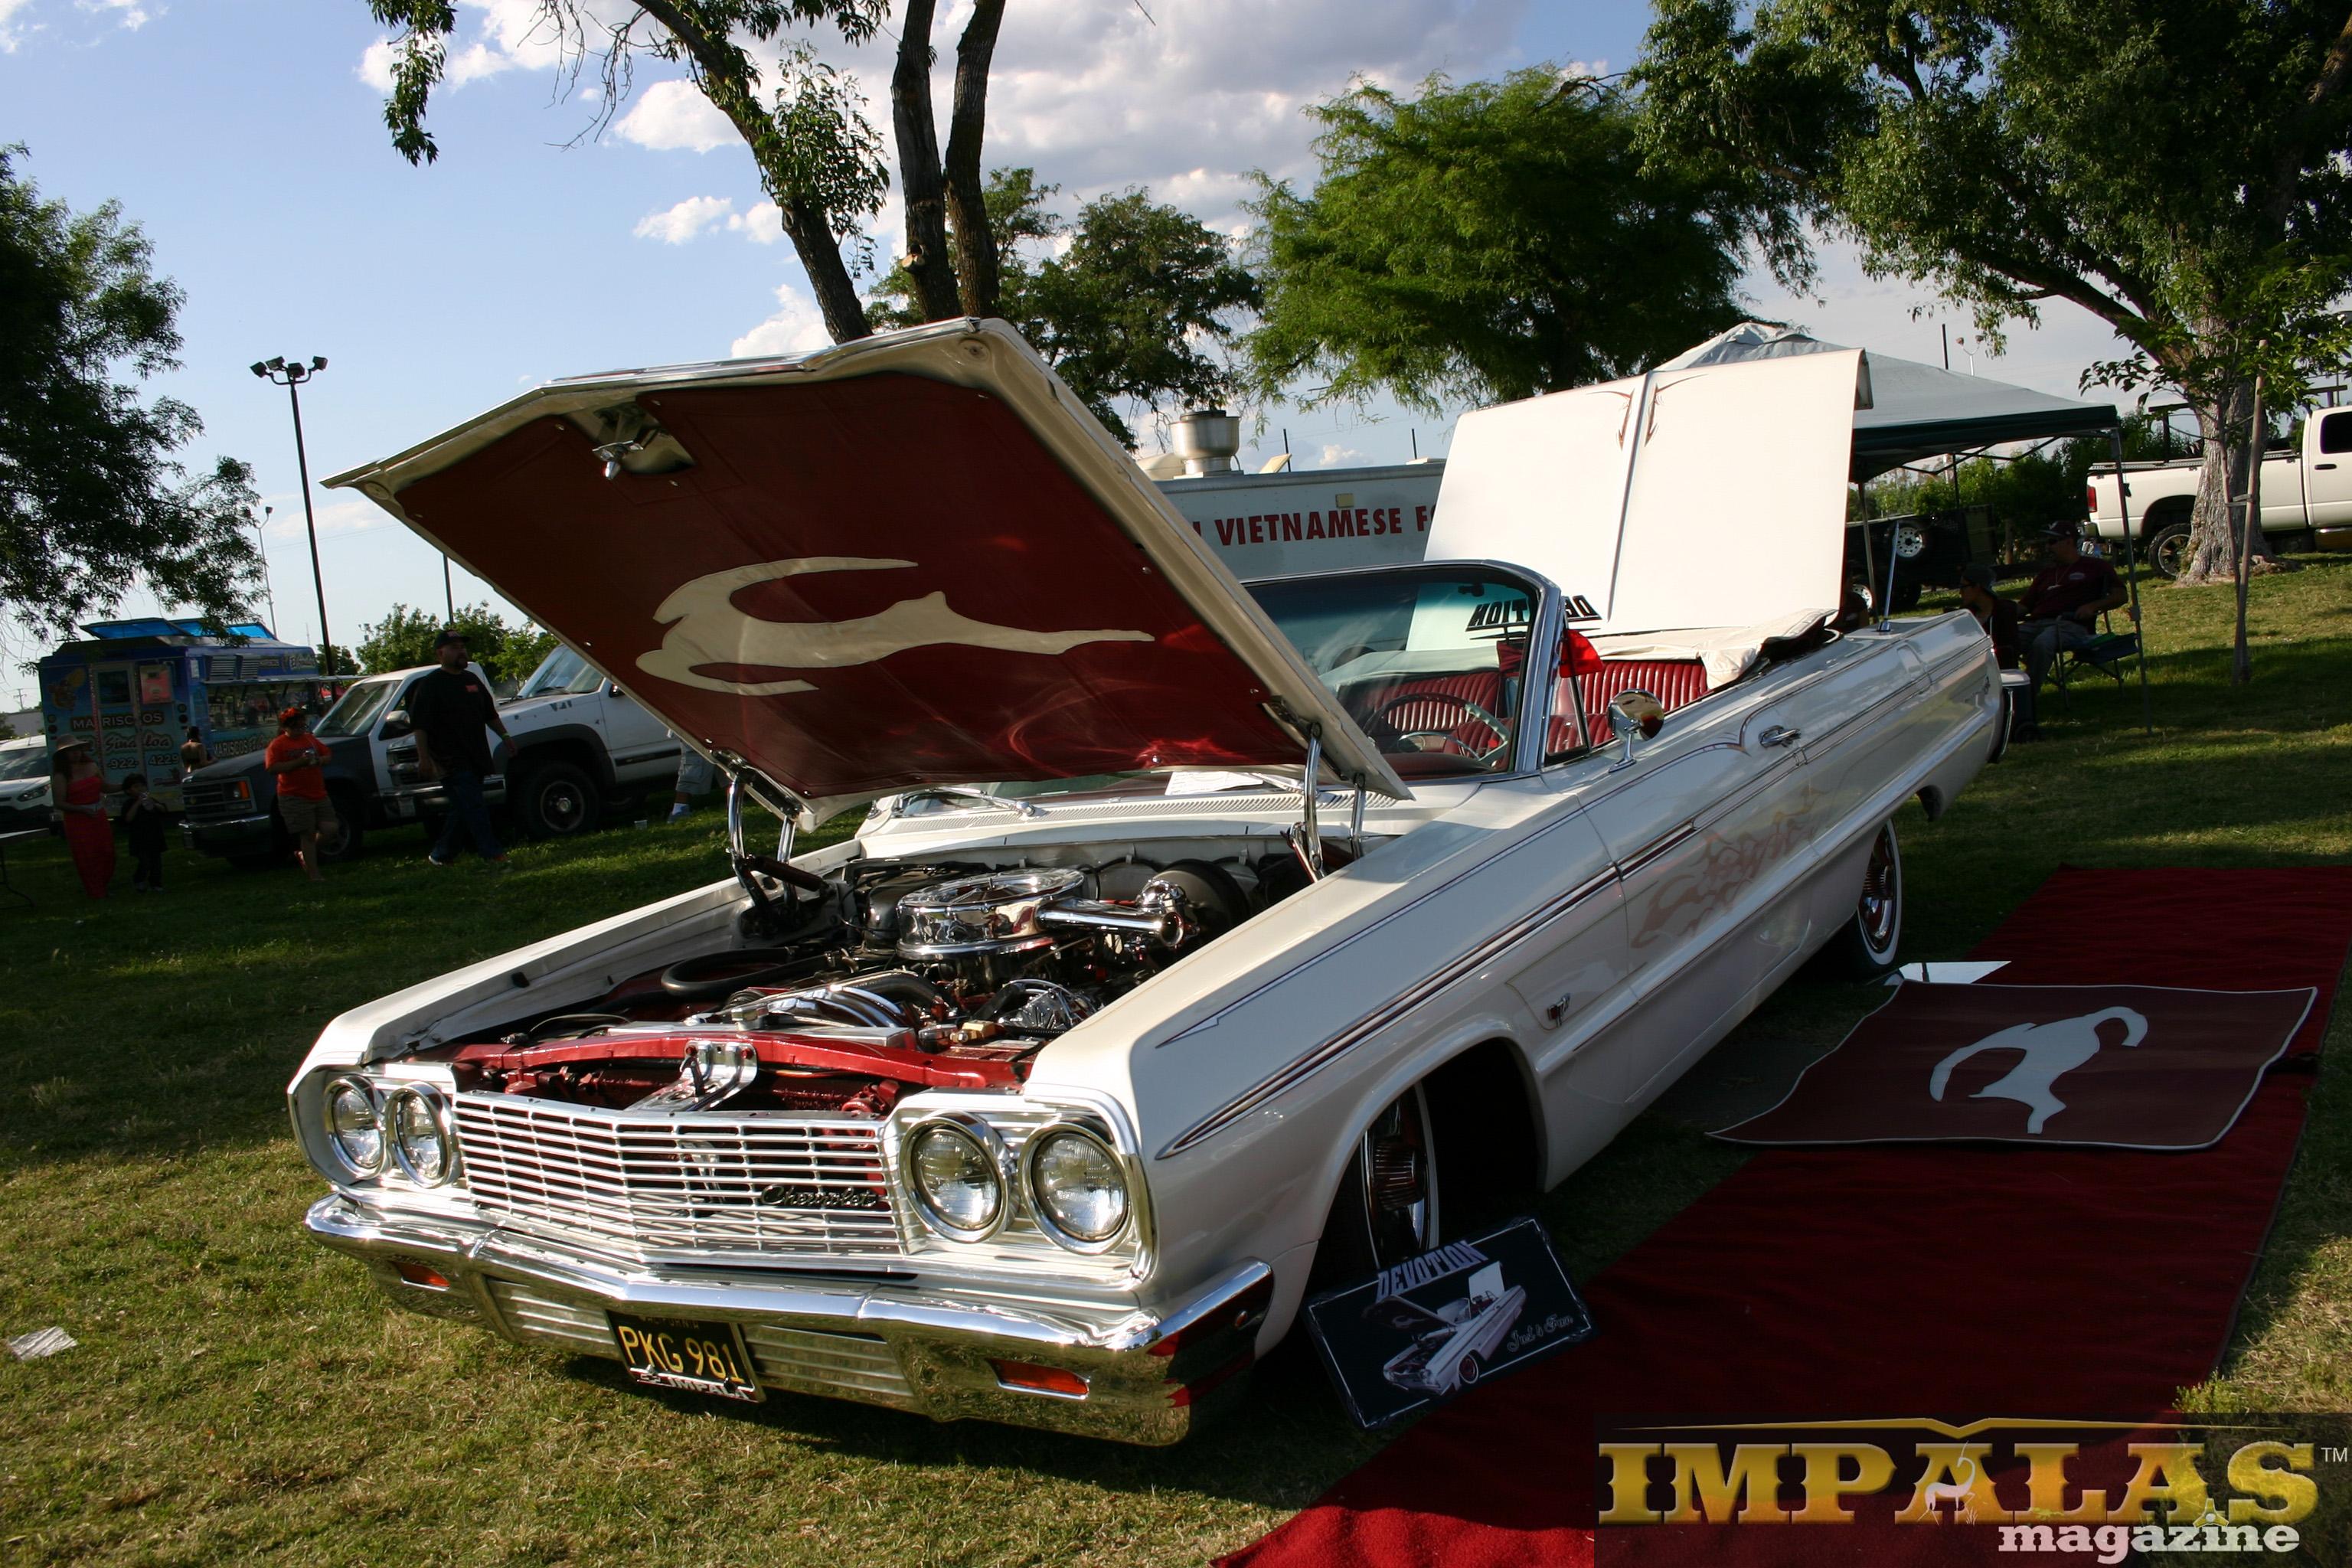 Impalasmagazine050116StocktonLowriderSupershow276.jpg